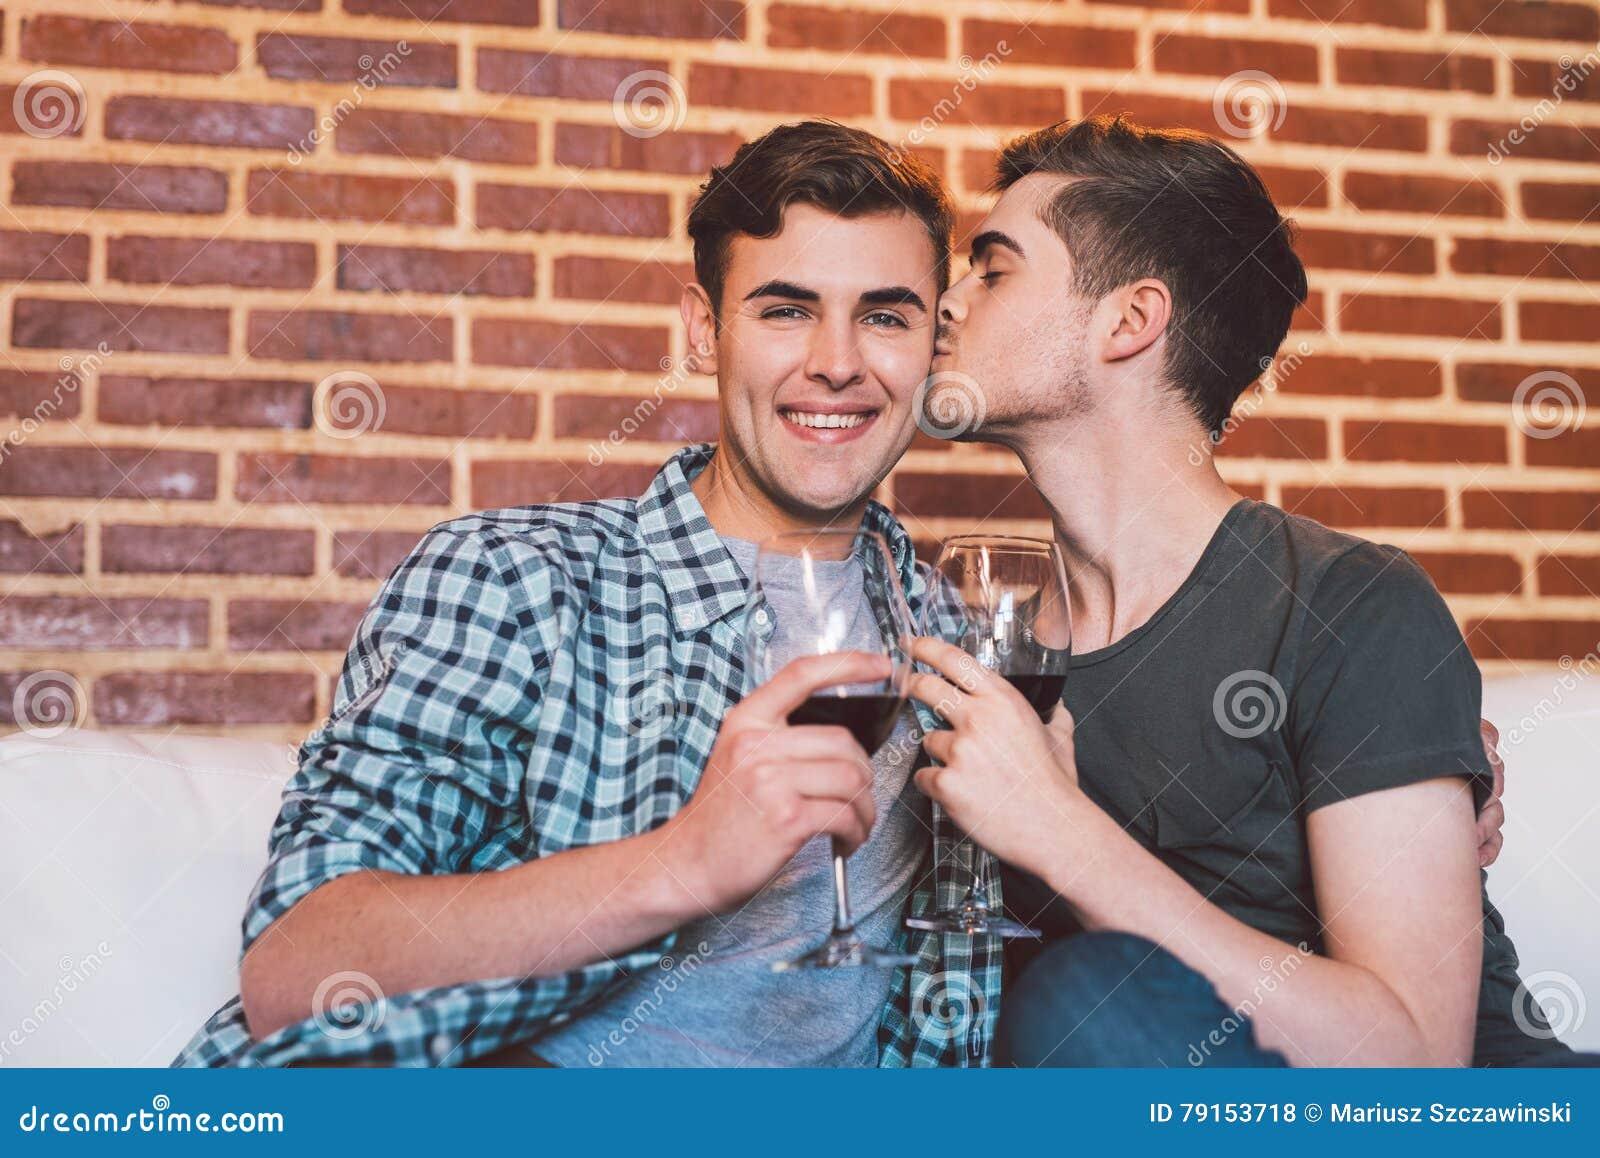 bästa online dating profil introduktion